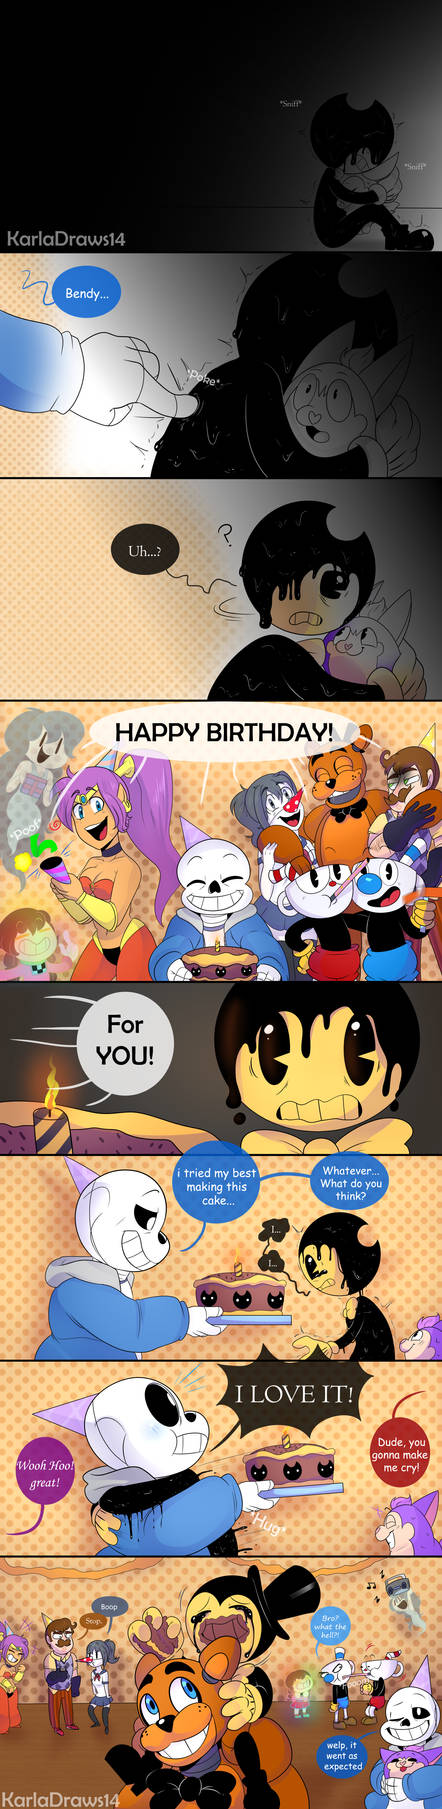 .:Birthday Boy:. by KarlaDraws14